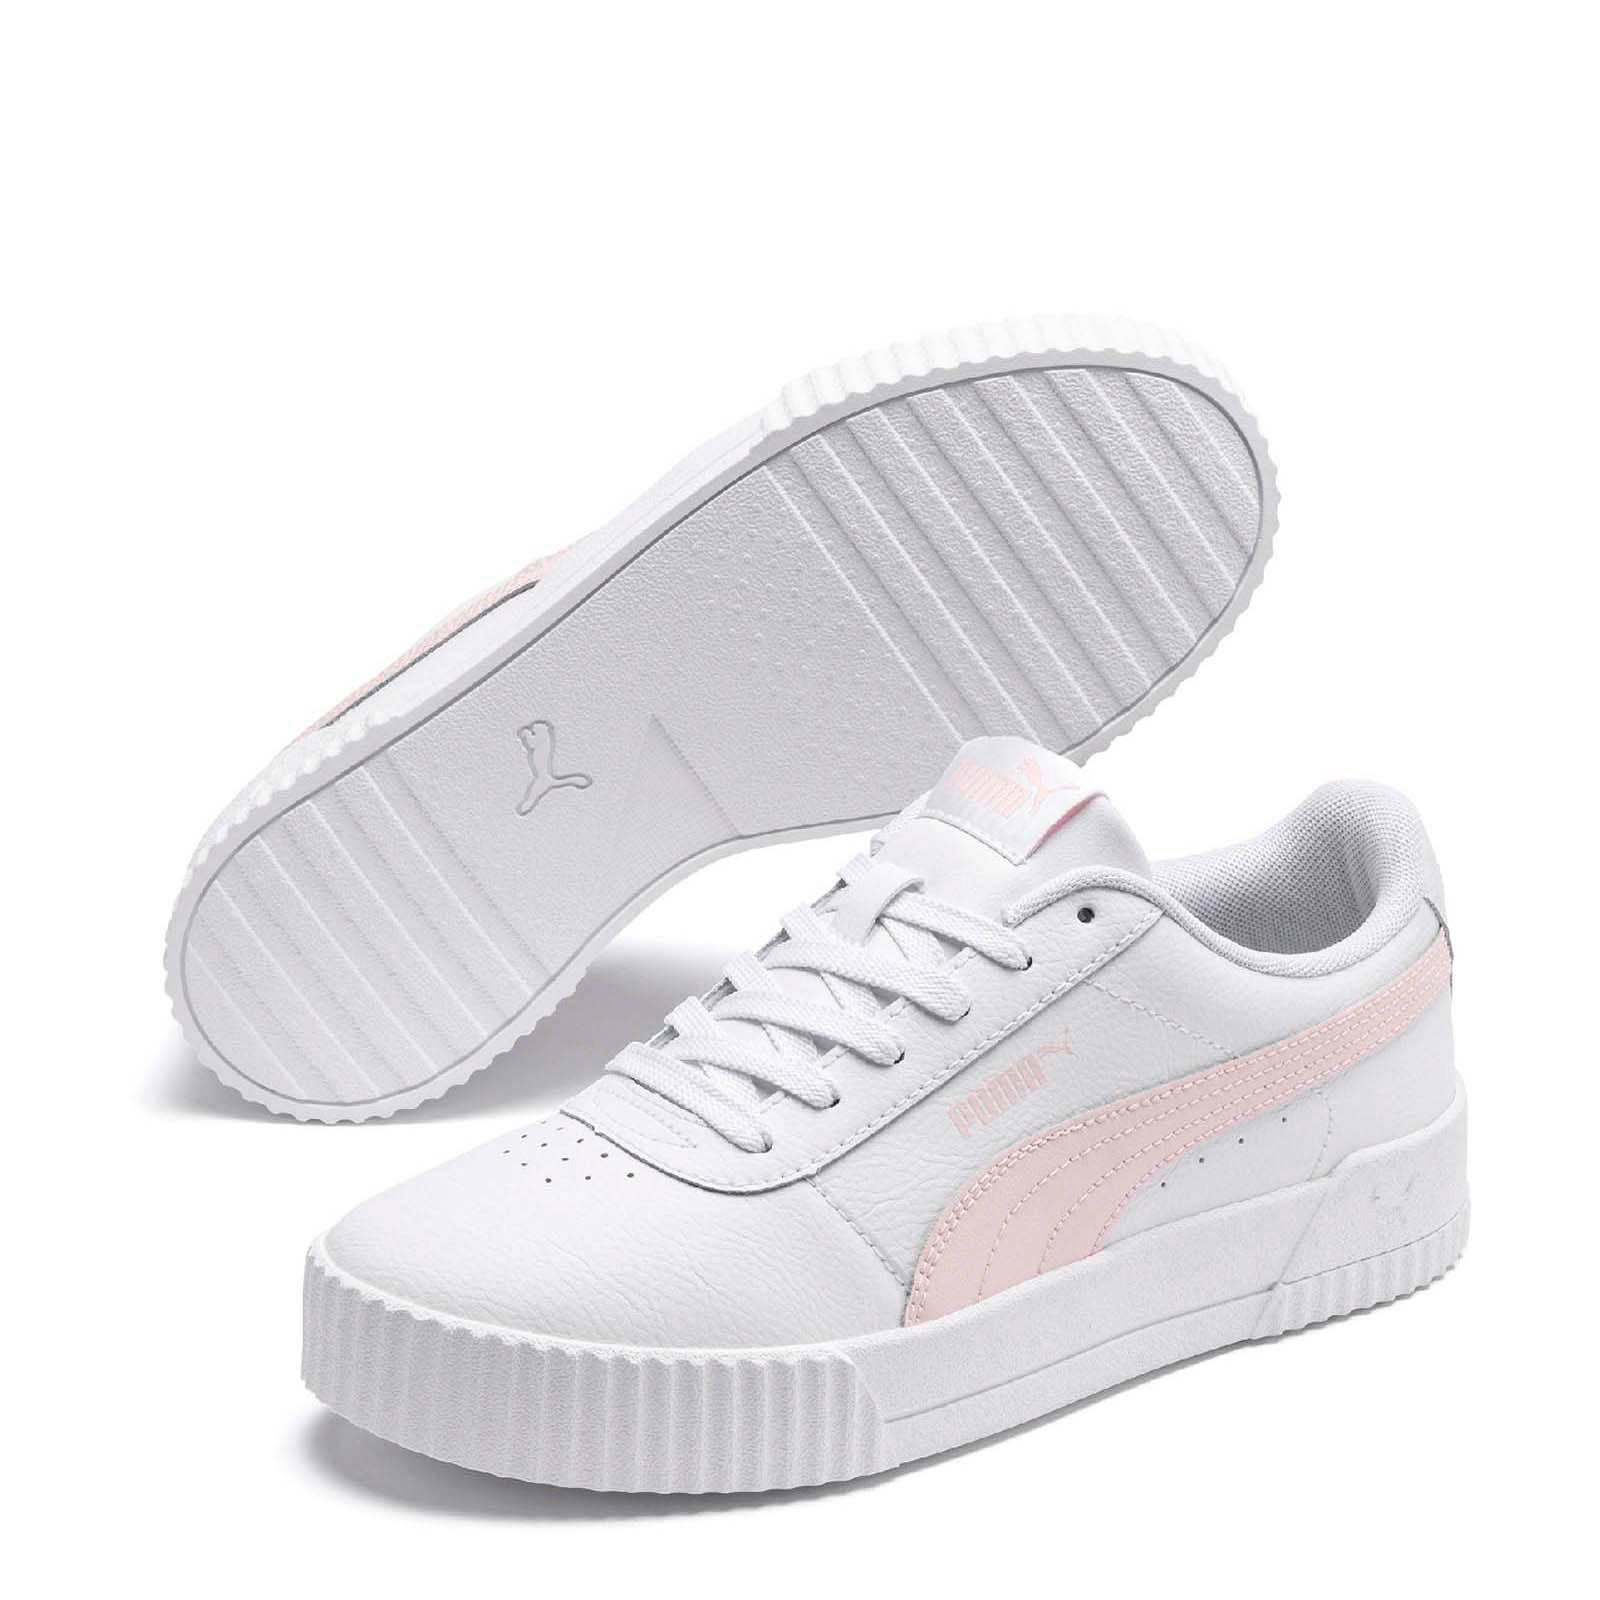 Puma Carina L sneakers wit/roze | wehkamp